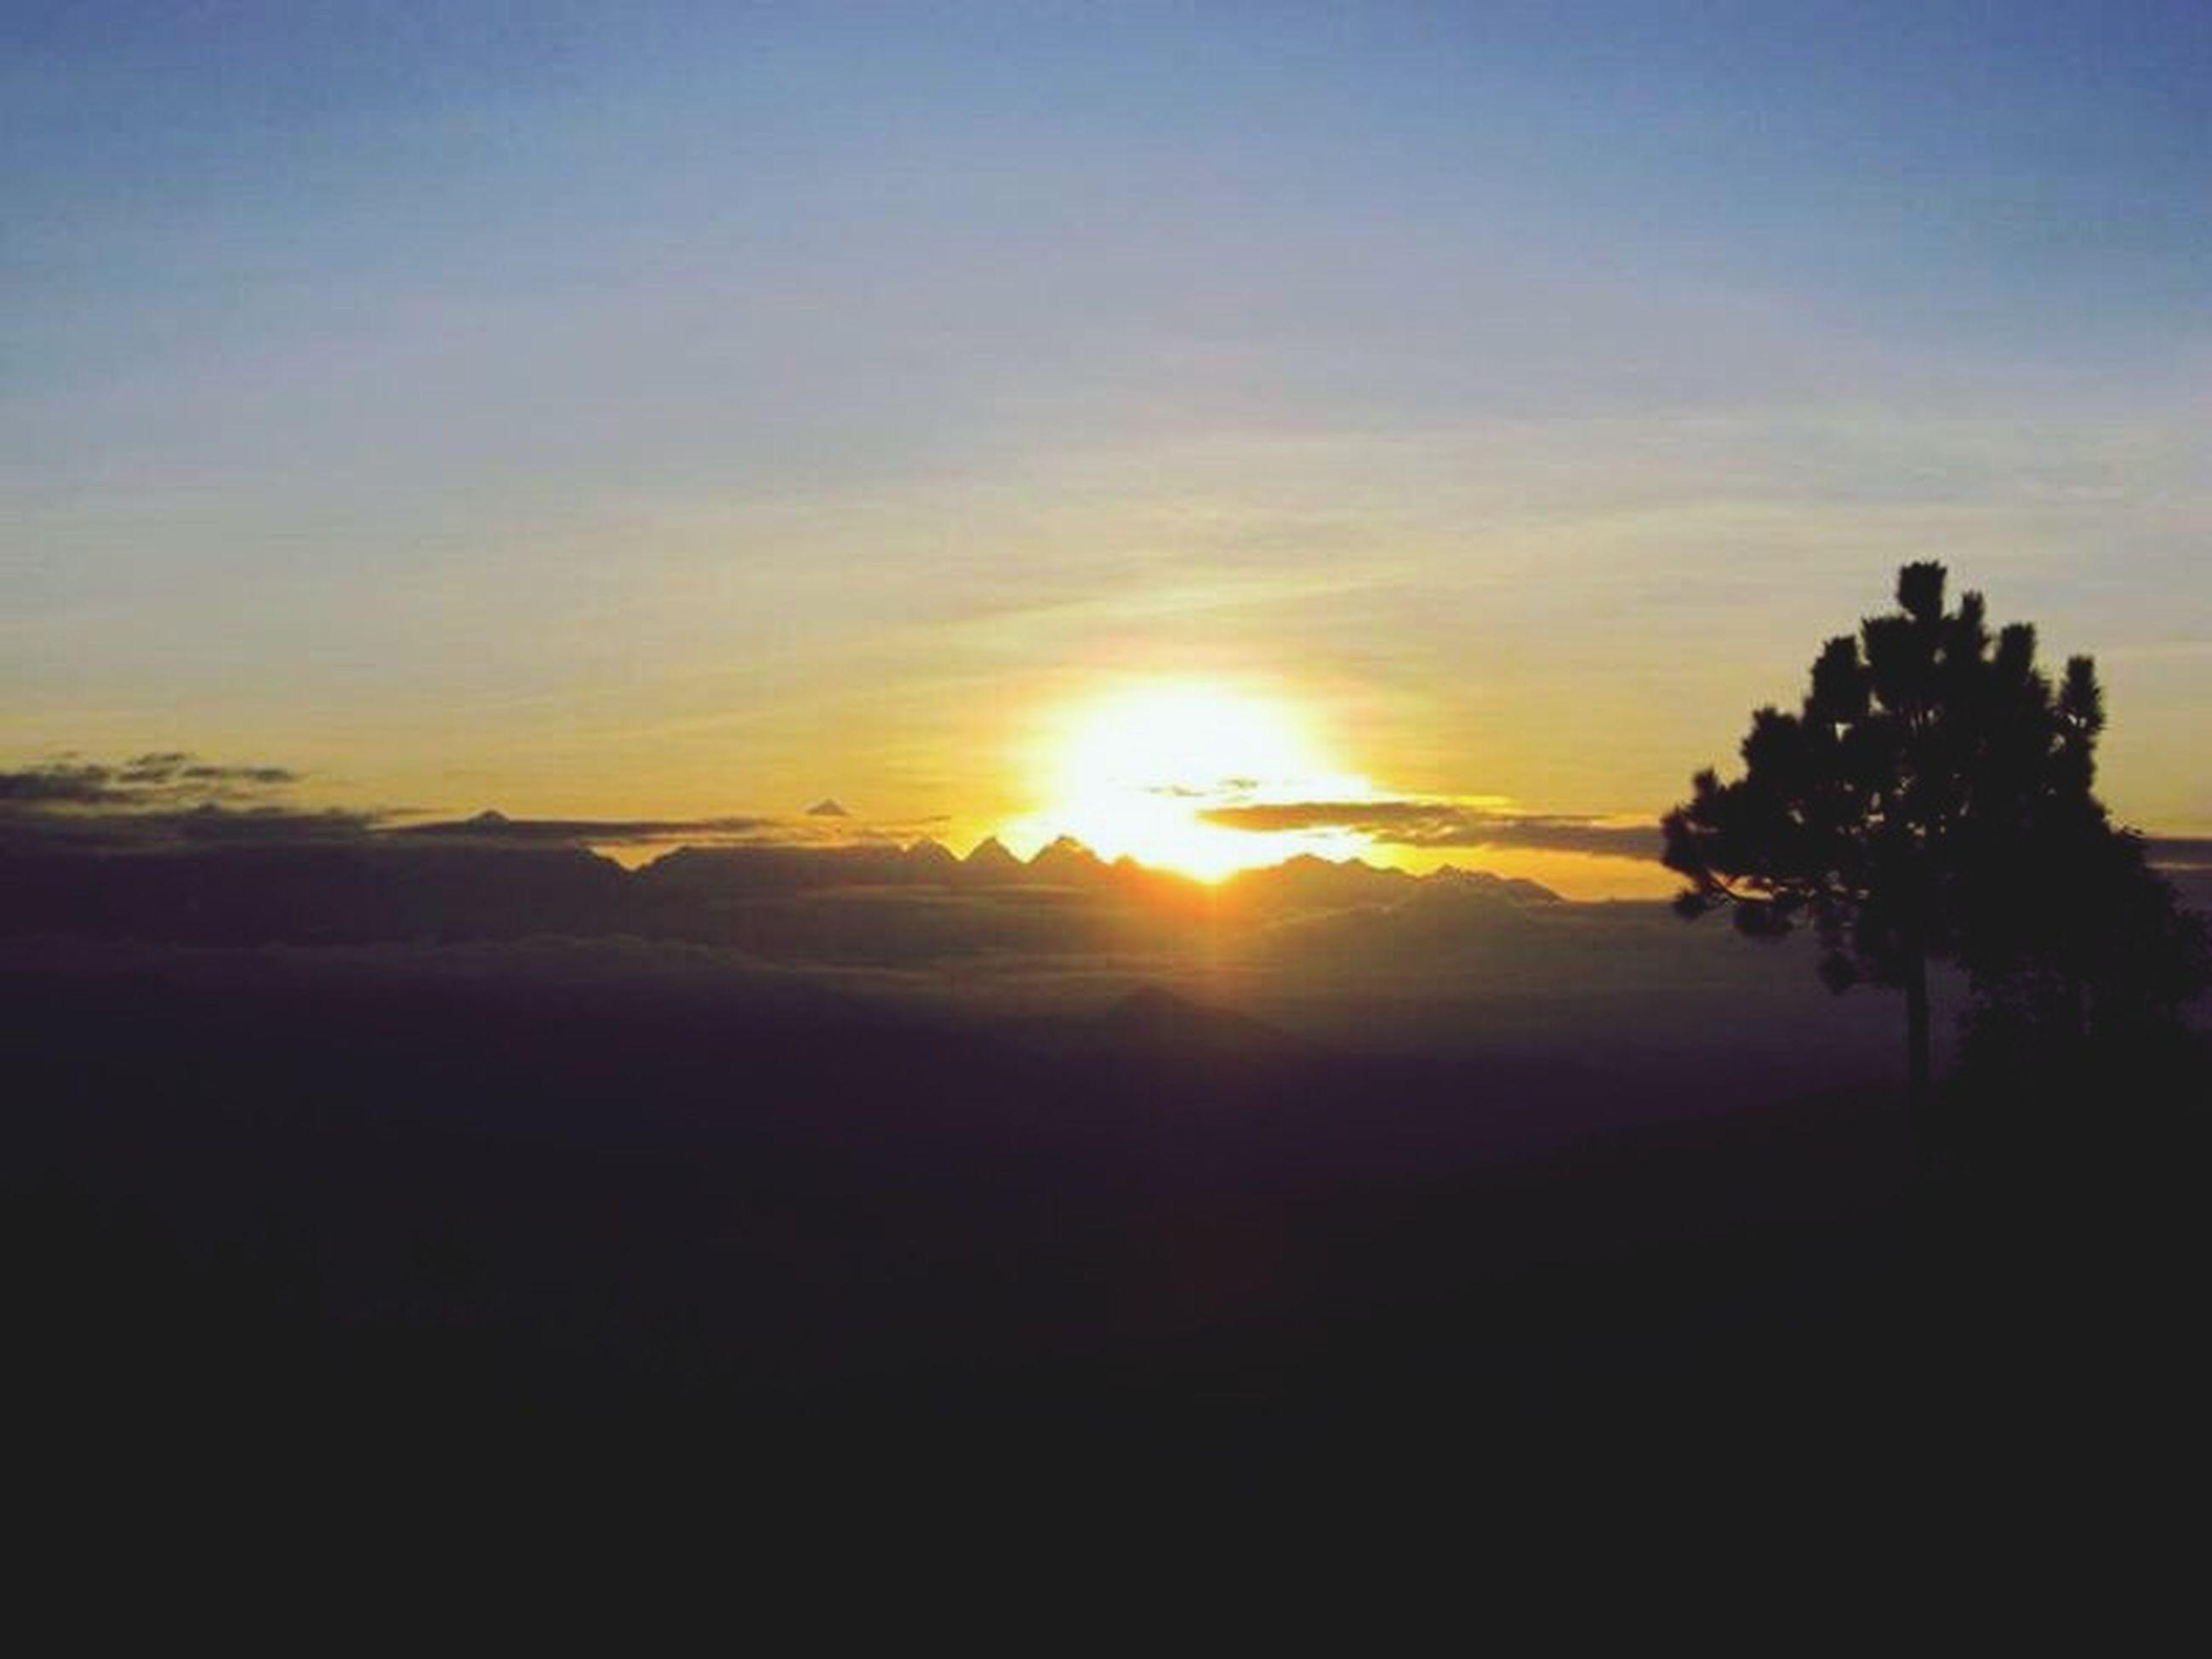 sunset, sun, tranquil scene, scenics, silhouette, tranquility, beauty in nature, sky, orange color, idyllic, nature, sunlight, landscape, sunbeam, tree, cloud - sky, outdoors, non-urban scene, mountain, no people